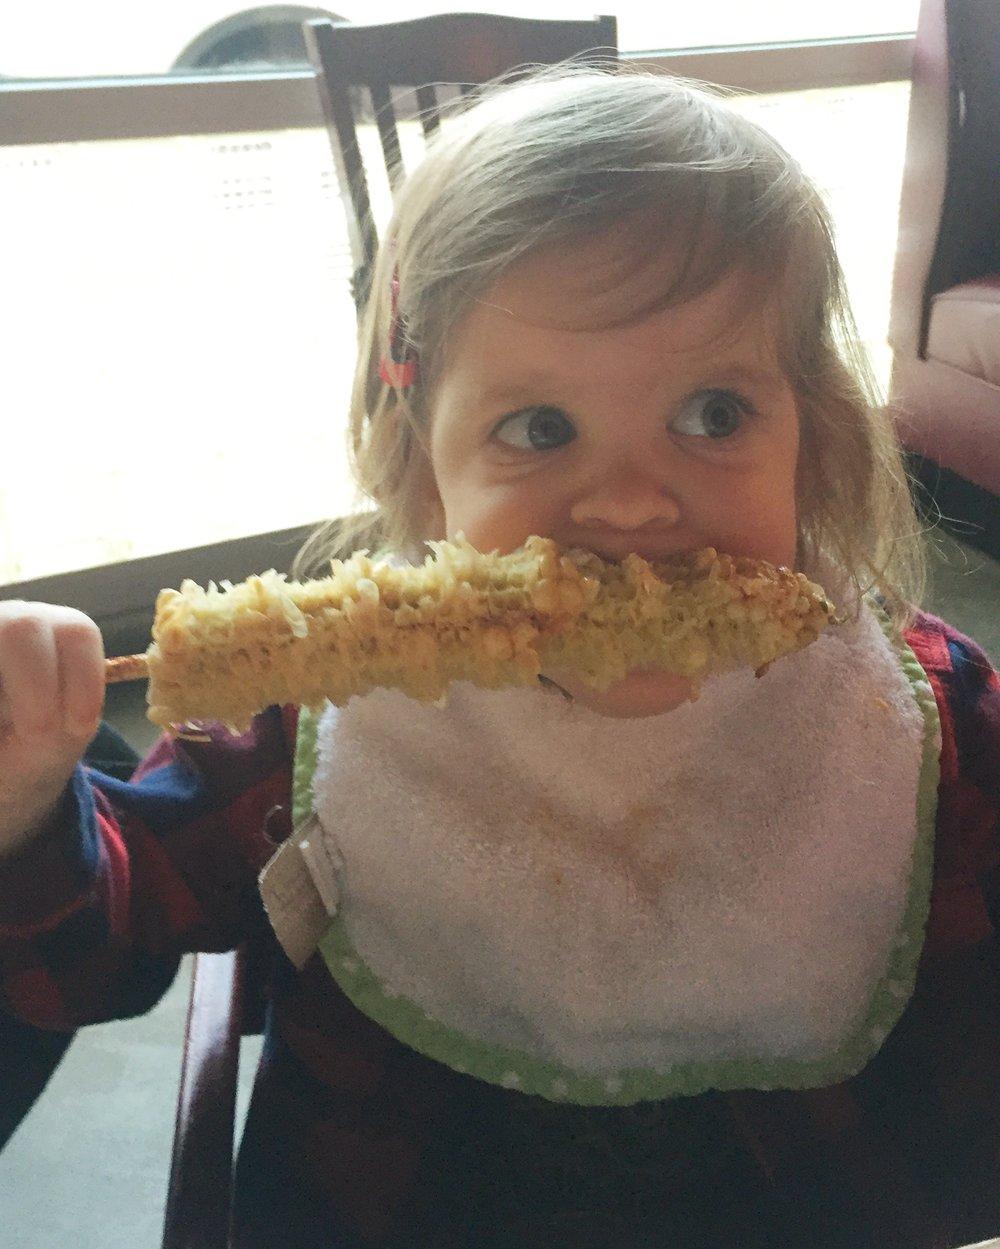 baby-eating-corn-sabor-noda-charlotte-nc